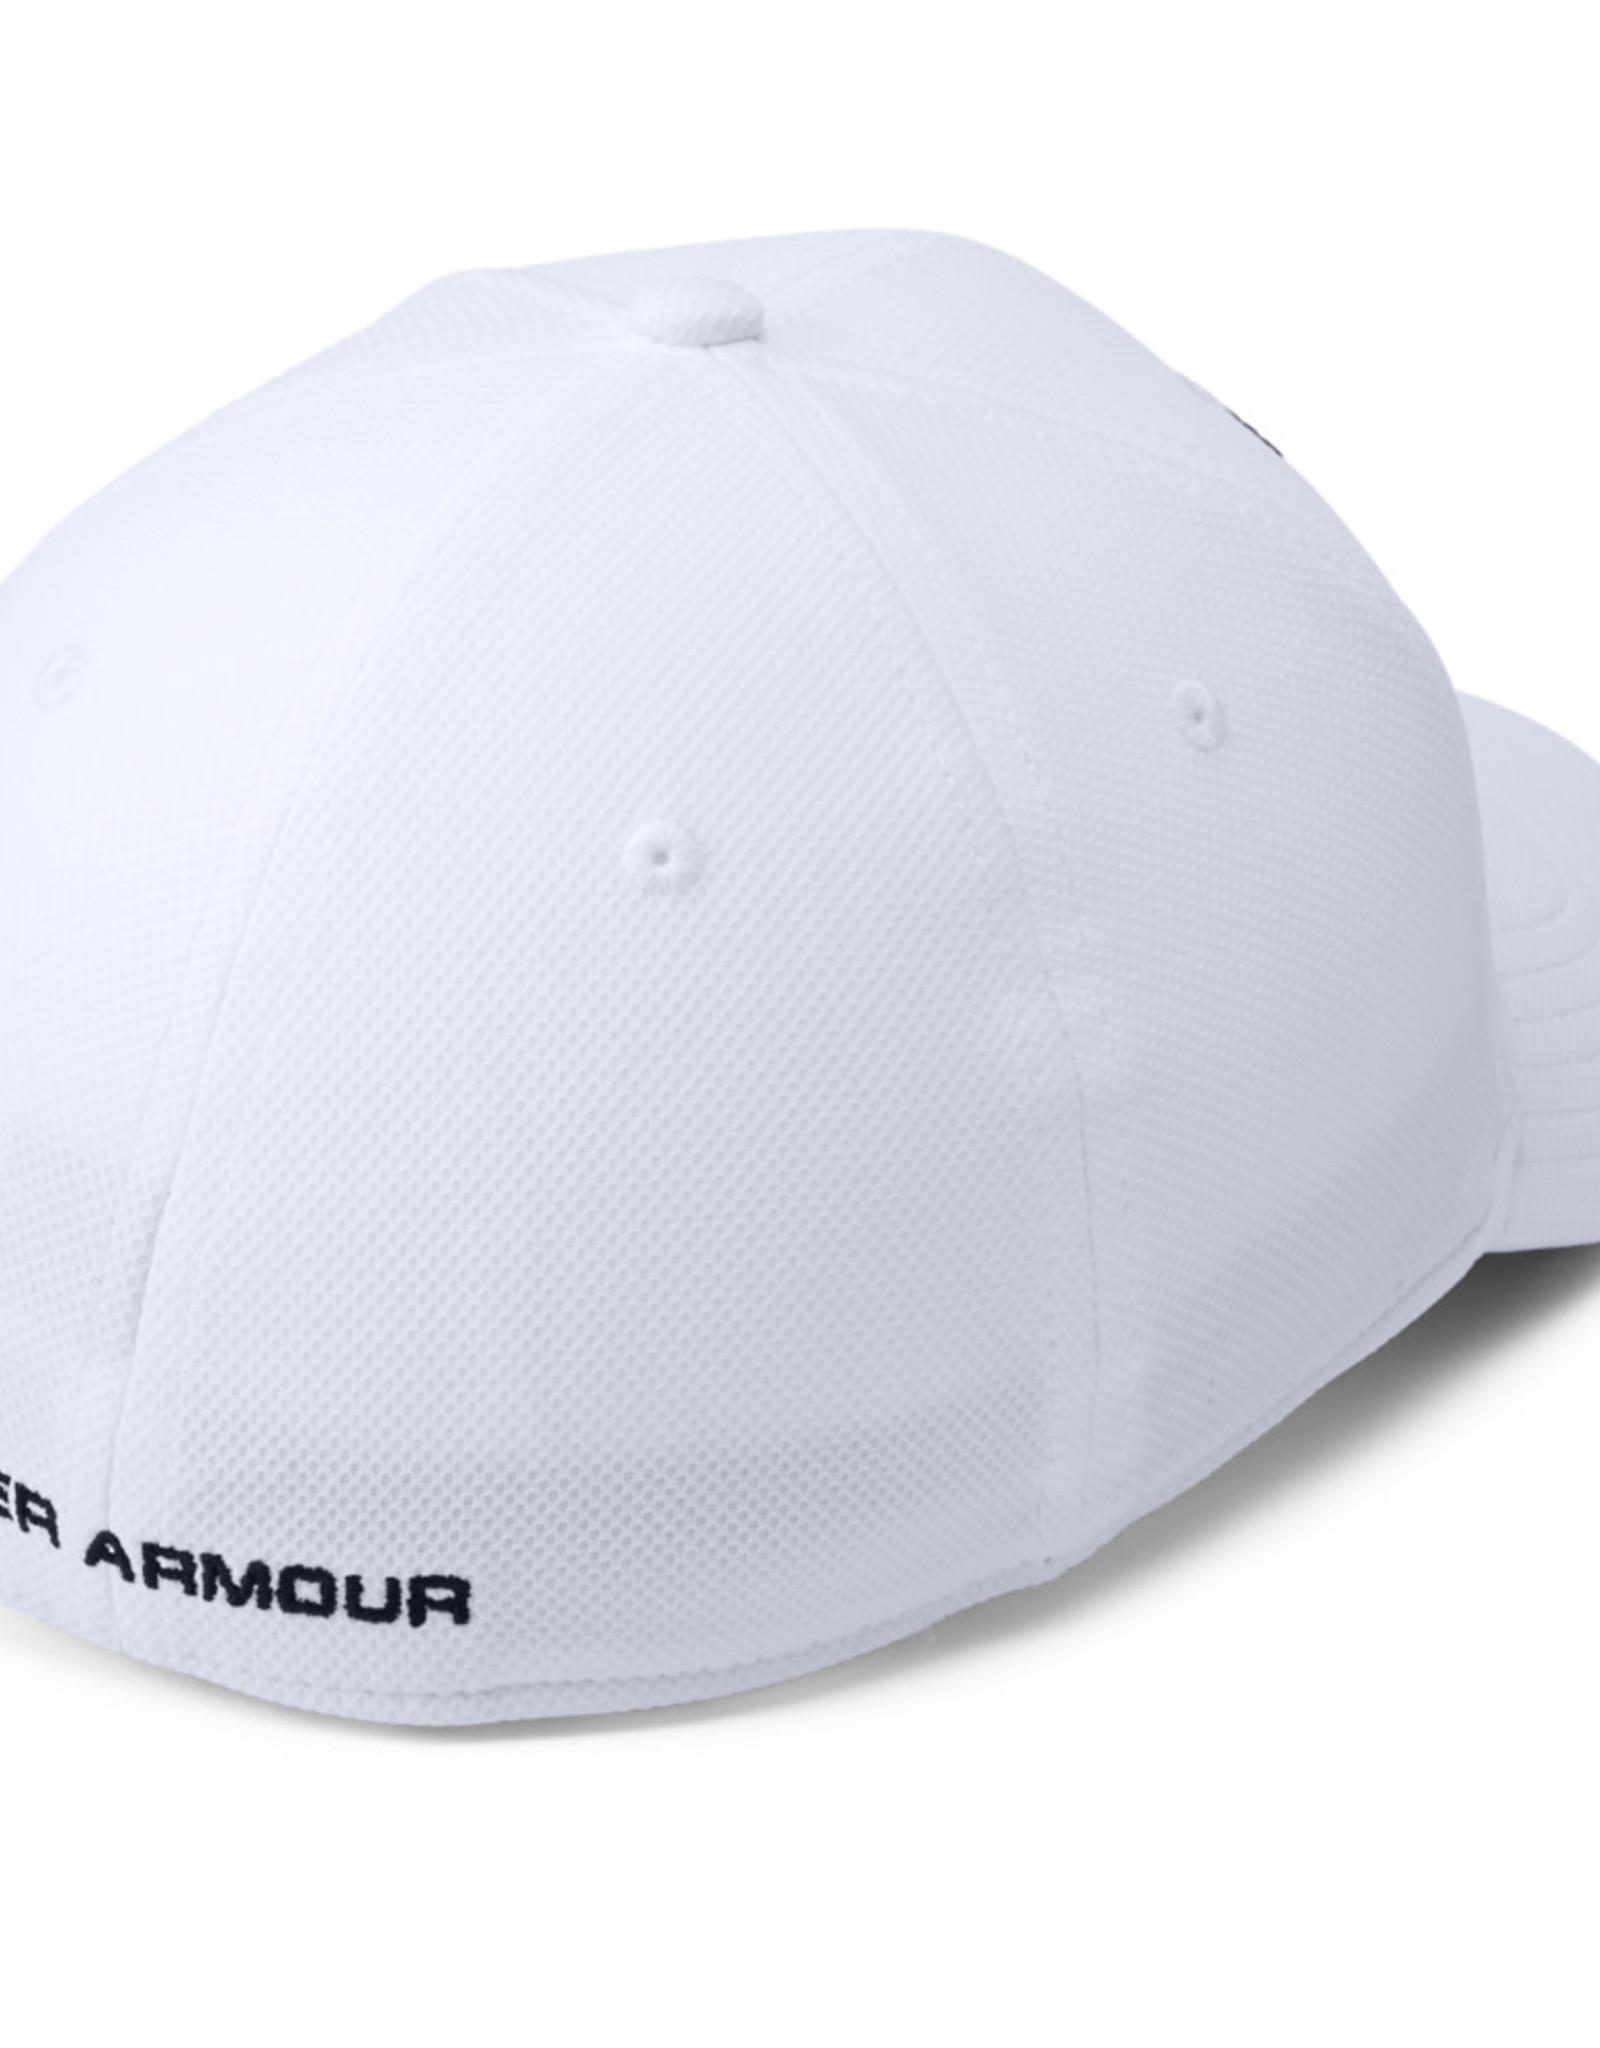 Under Armour UA Men's Blitzing 3.0 Cap - White-Steel-Black